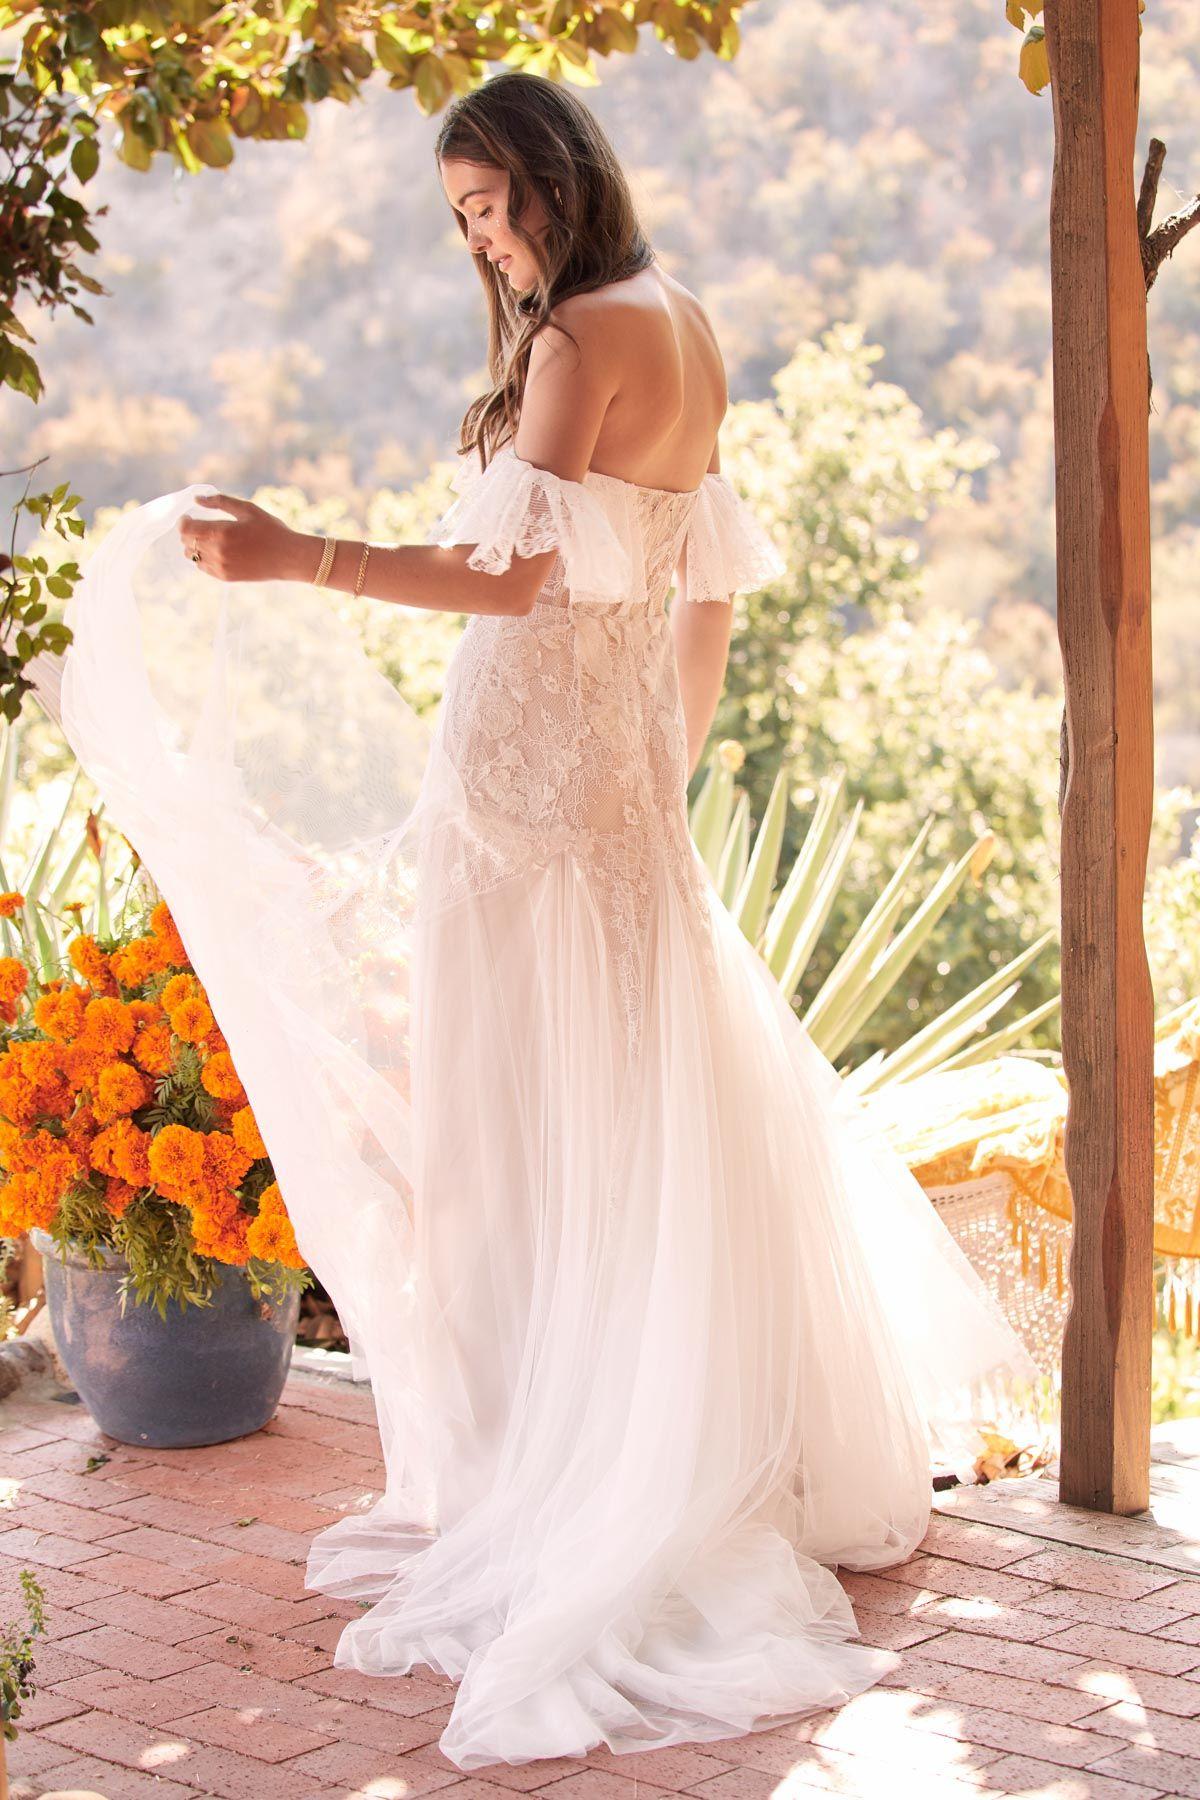 Willowby Mackinnon Boho Wedding Dress Boho Bride Dress Lace Wedding Dress Vintage [ 1800 x 1200 Pixel ]